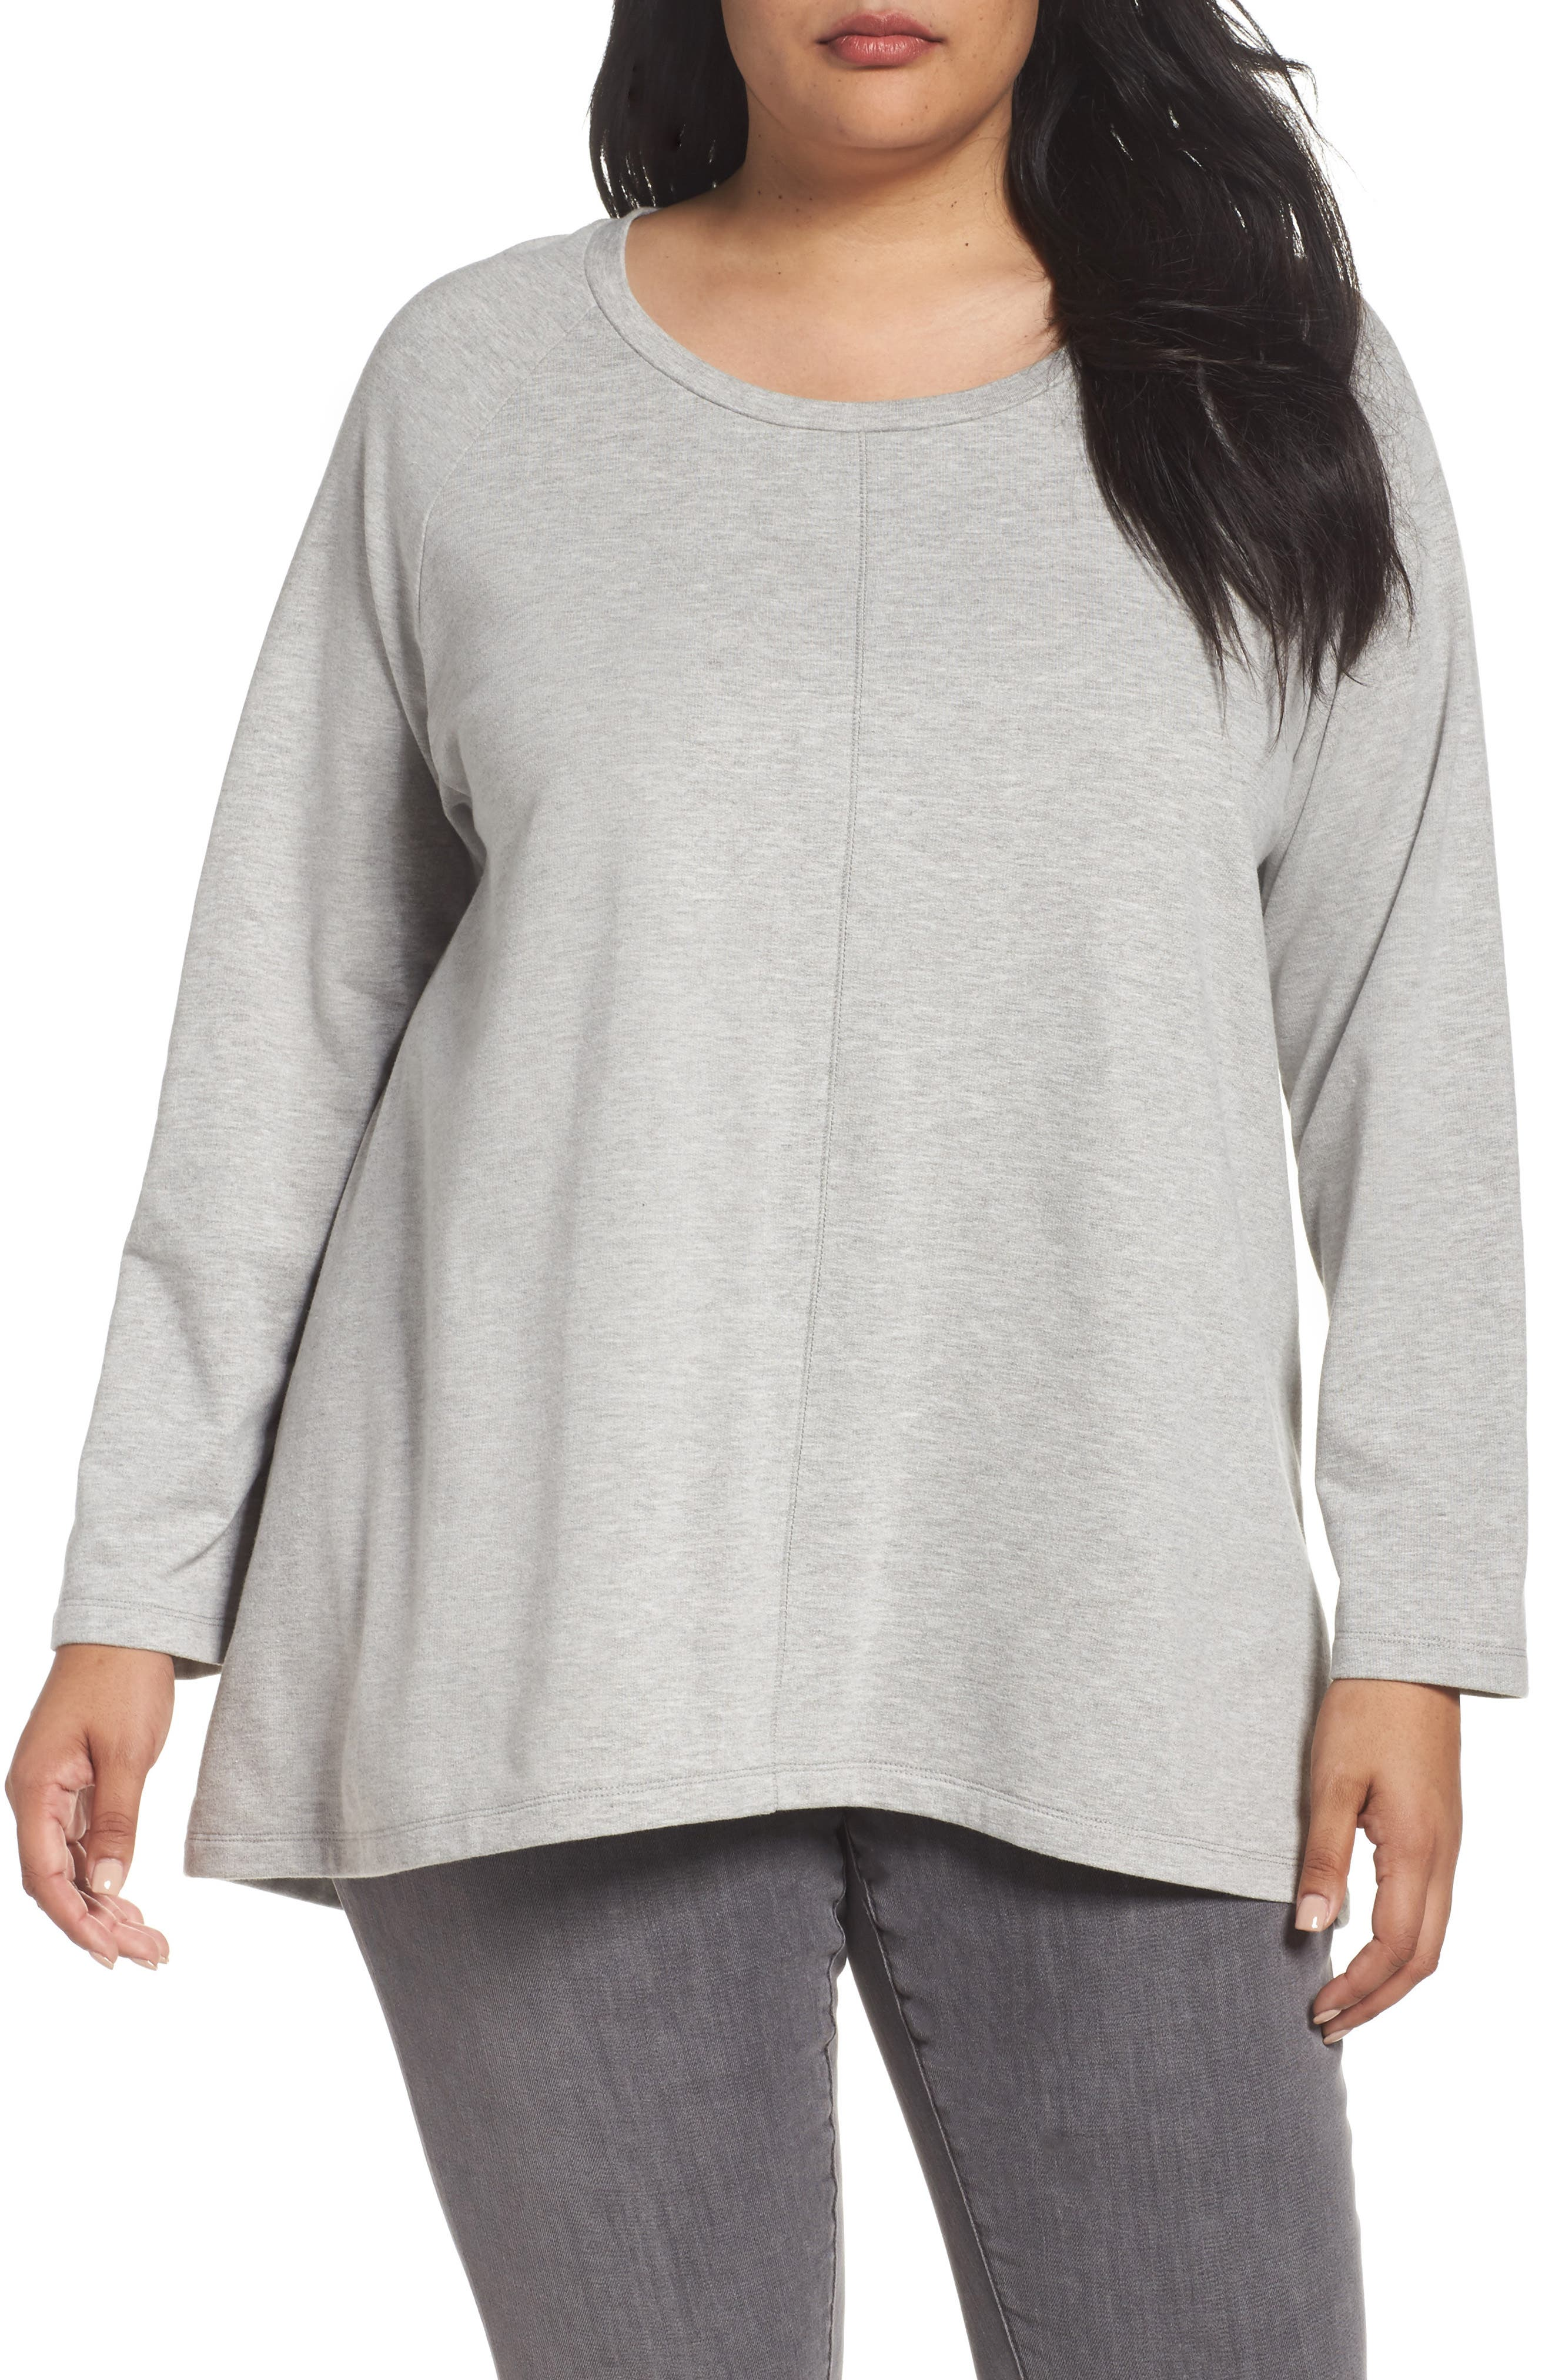 Alternate Image 1 Selected - Caslon® High/Low Sweatshirt (Plus Size)